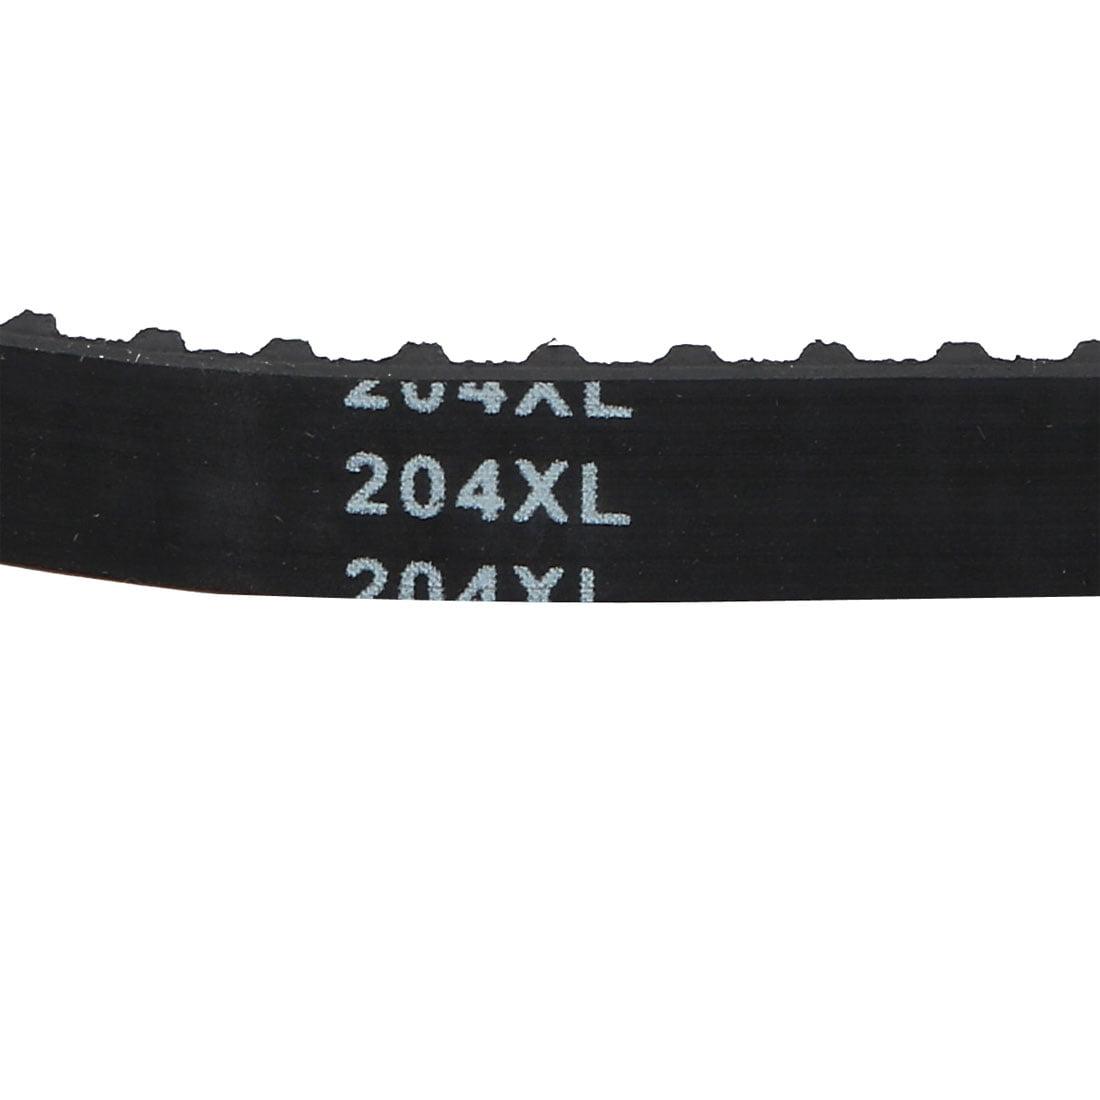 204XL Timing Belt 102 Teeth 10 mm Wide 5.08mm Pitch Stepper Motor Rubber Black